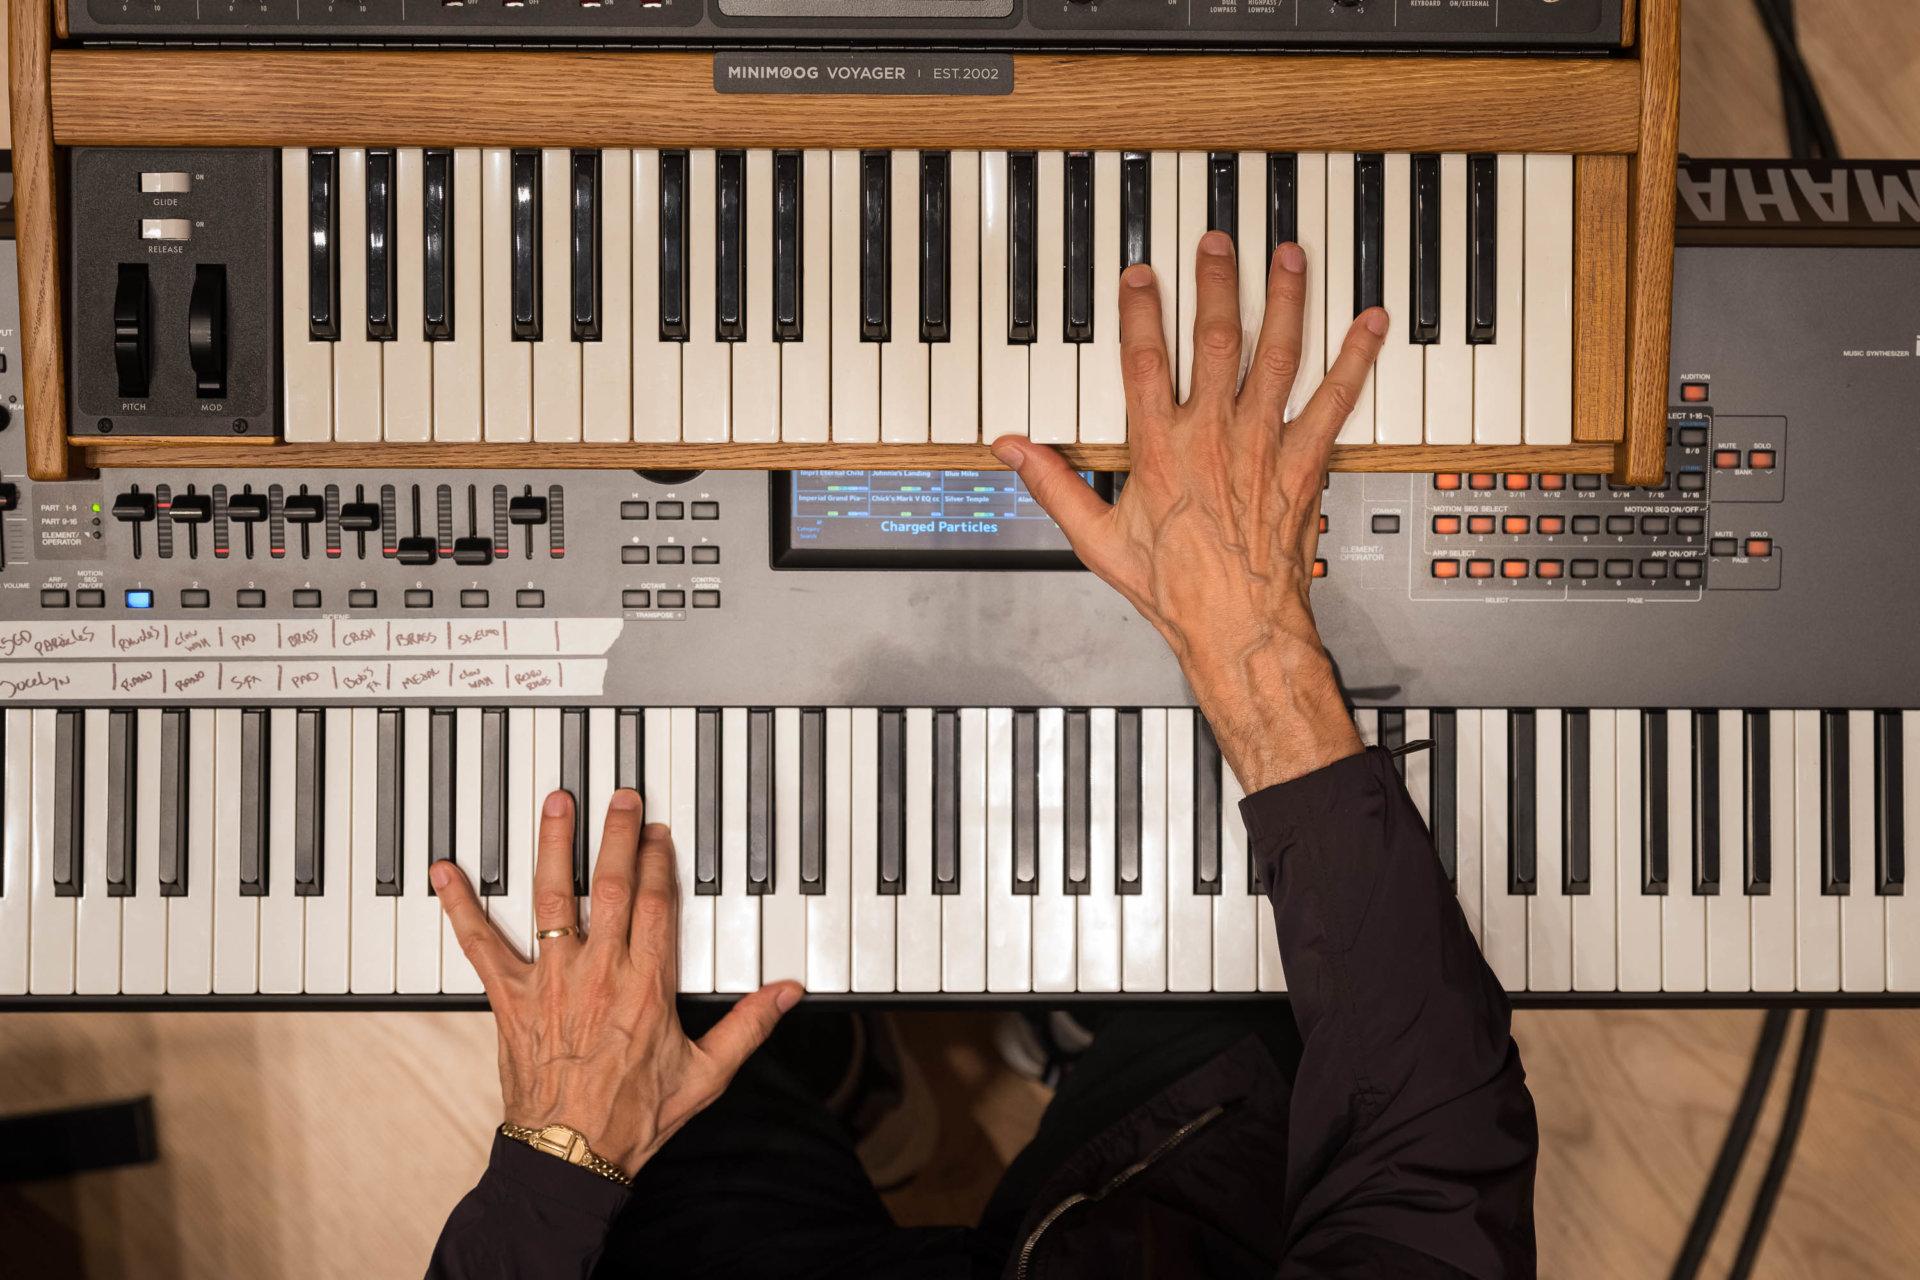 Chick Corea, Jazztage Dresden, Kultur, Kulturpalast, Pianist, Projekt, Serie, dresden, klavier, konzert, meisterfinger, musiker, piano